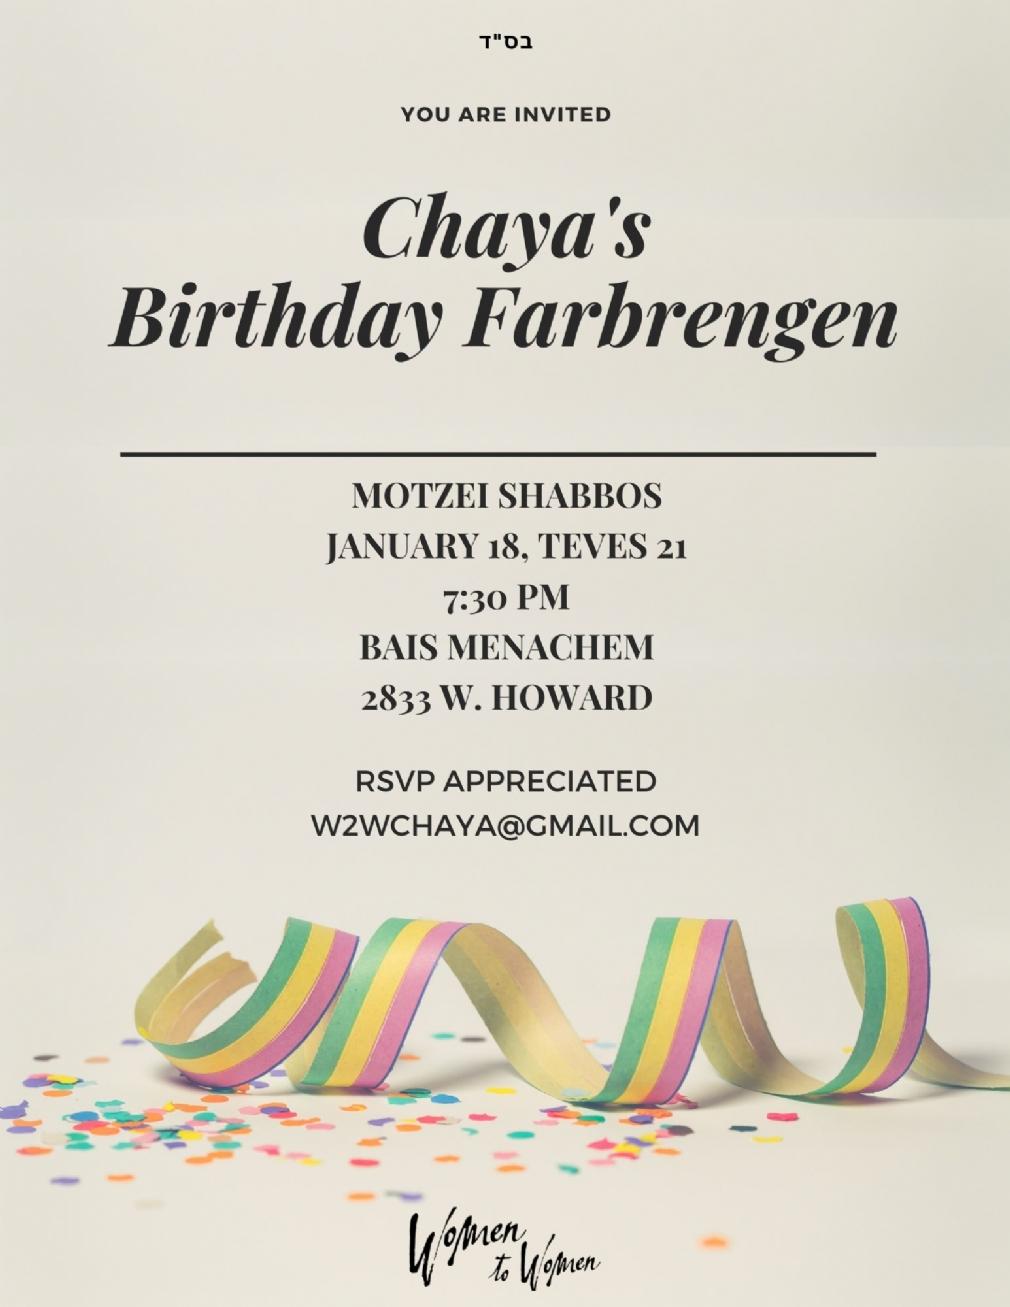 Chaya's Birthday Party.jpg